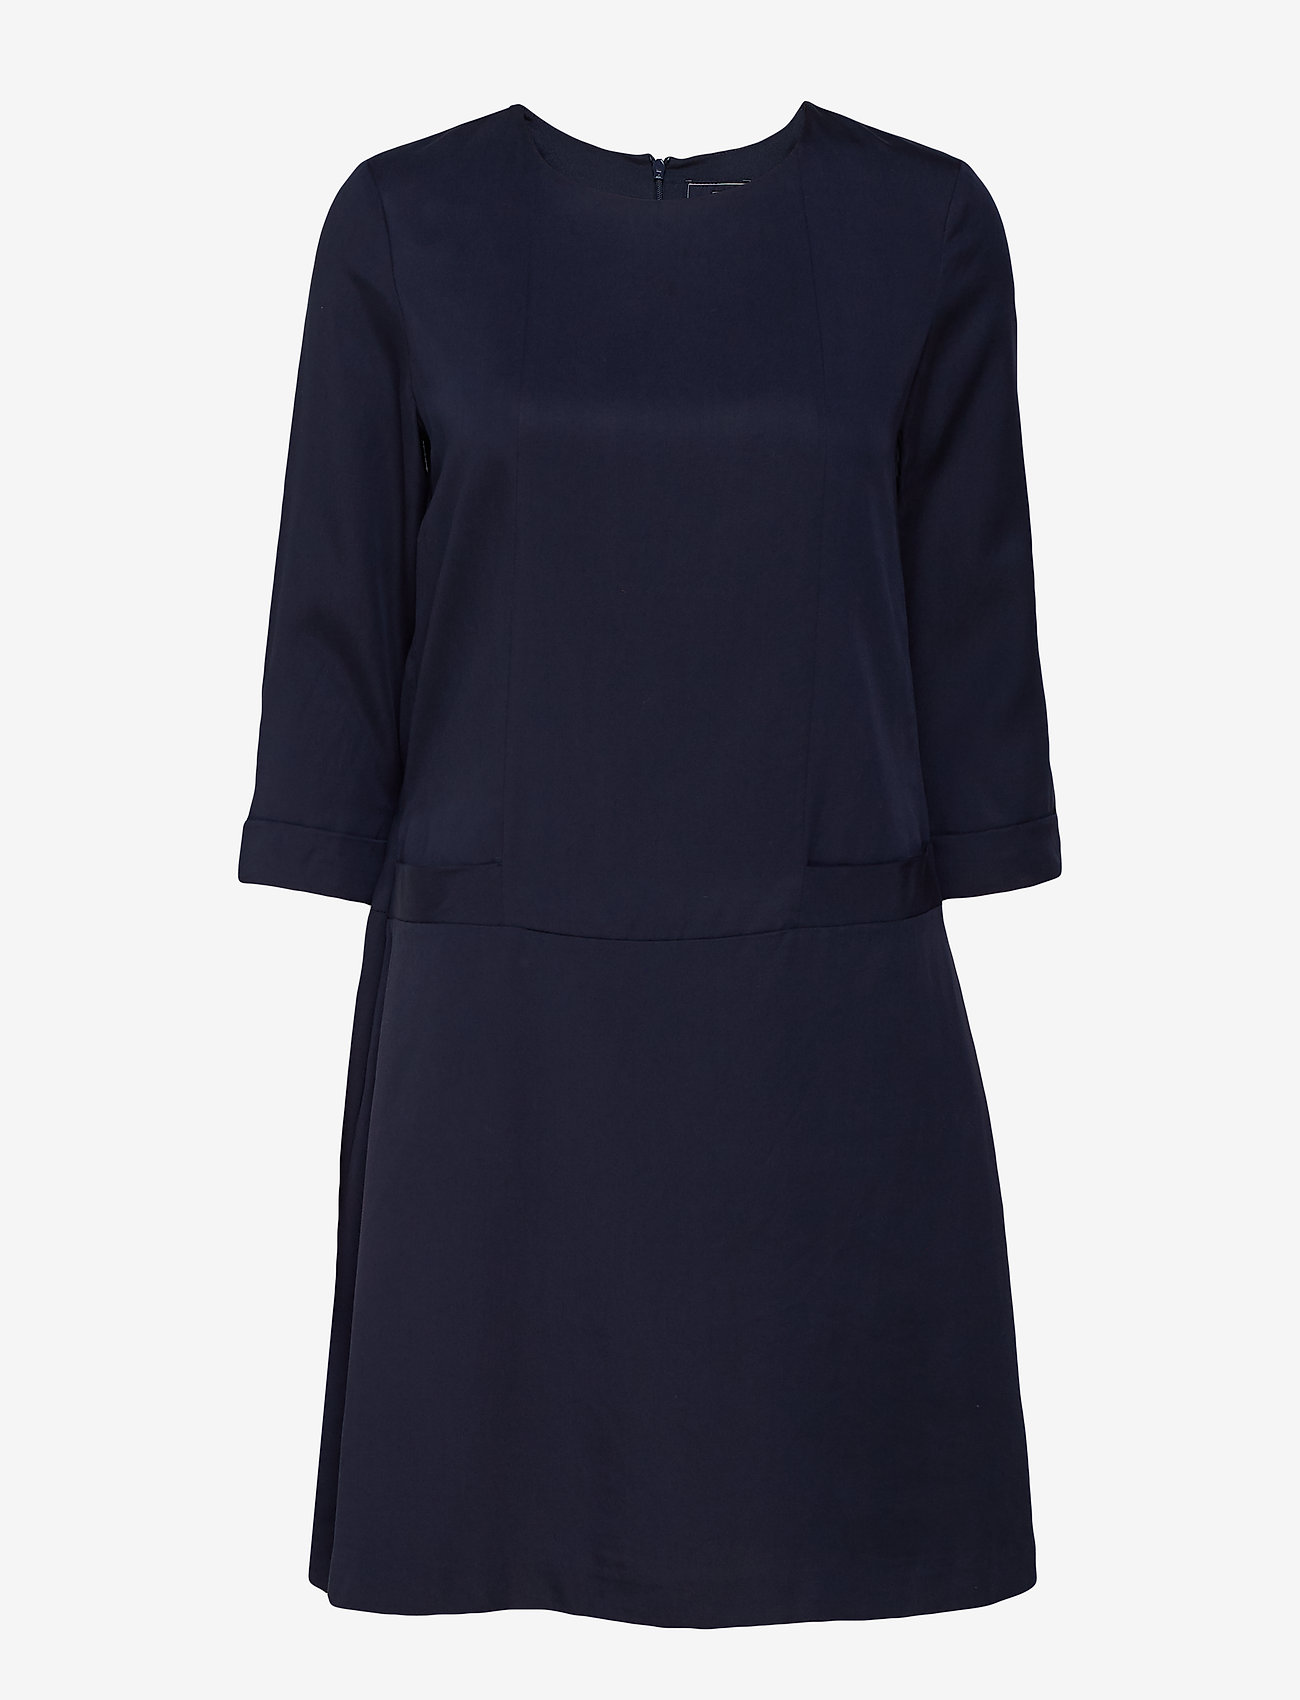 Park Lane - Dress - courtes robes - navy